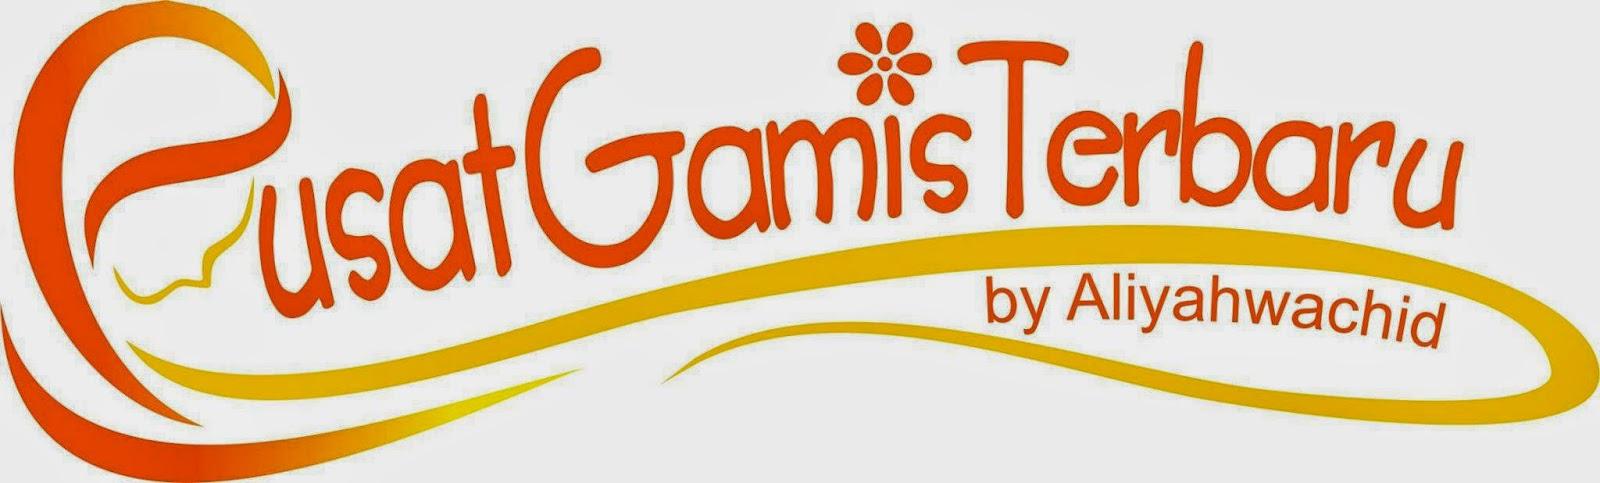 Lowongan Kerja di Pusat Gamis Terbaru – Semarang (Admin Web dan Fanpage FB, Customer Service dan Logistik)